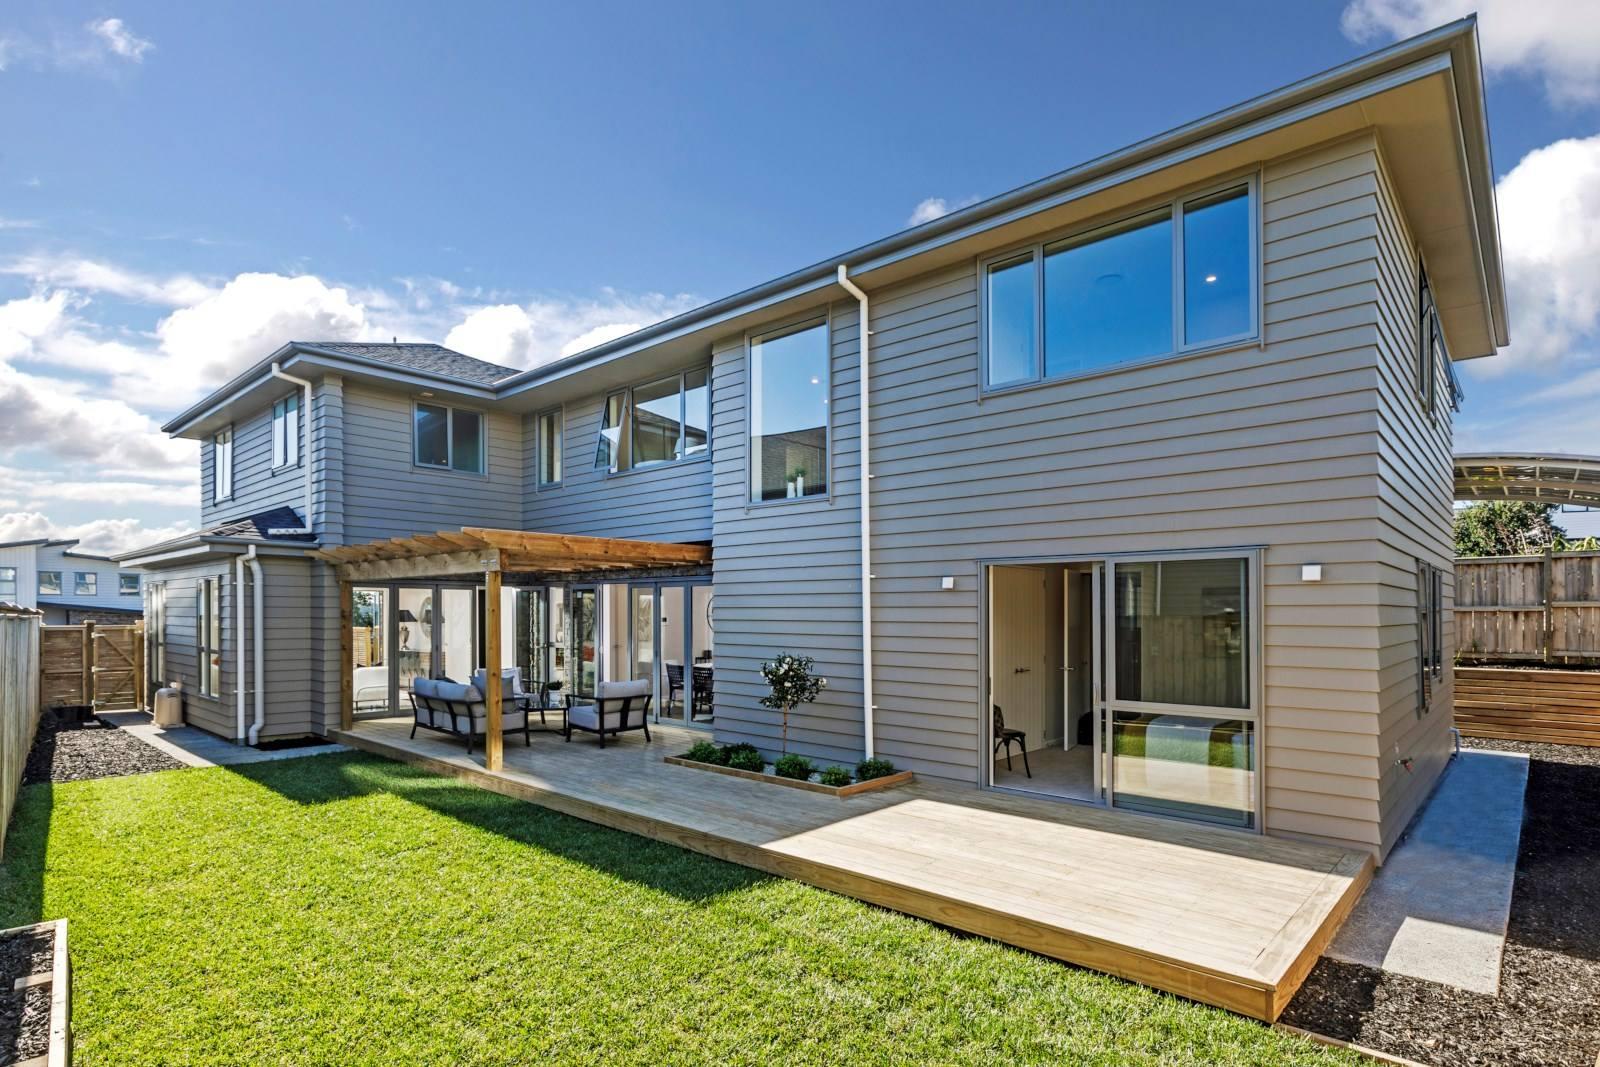 Long Bay 5房 现代化迷人新居 风格时尚 采光一流 近海滩&繁华中心 成长型家庭优选! Gorgeous Outdoor Living - Modern Brand New Home